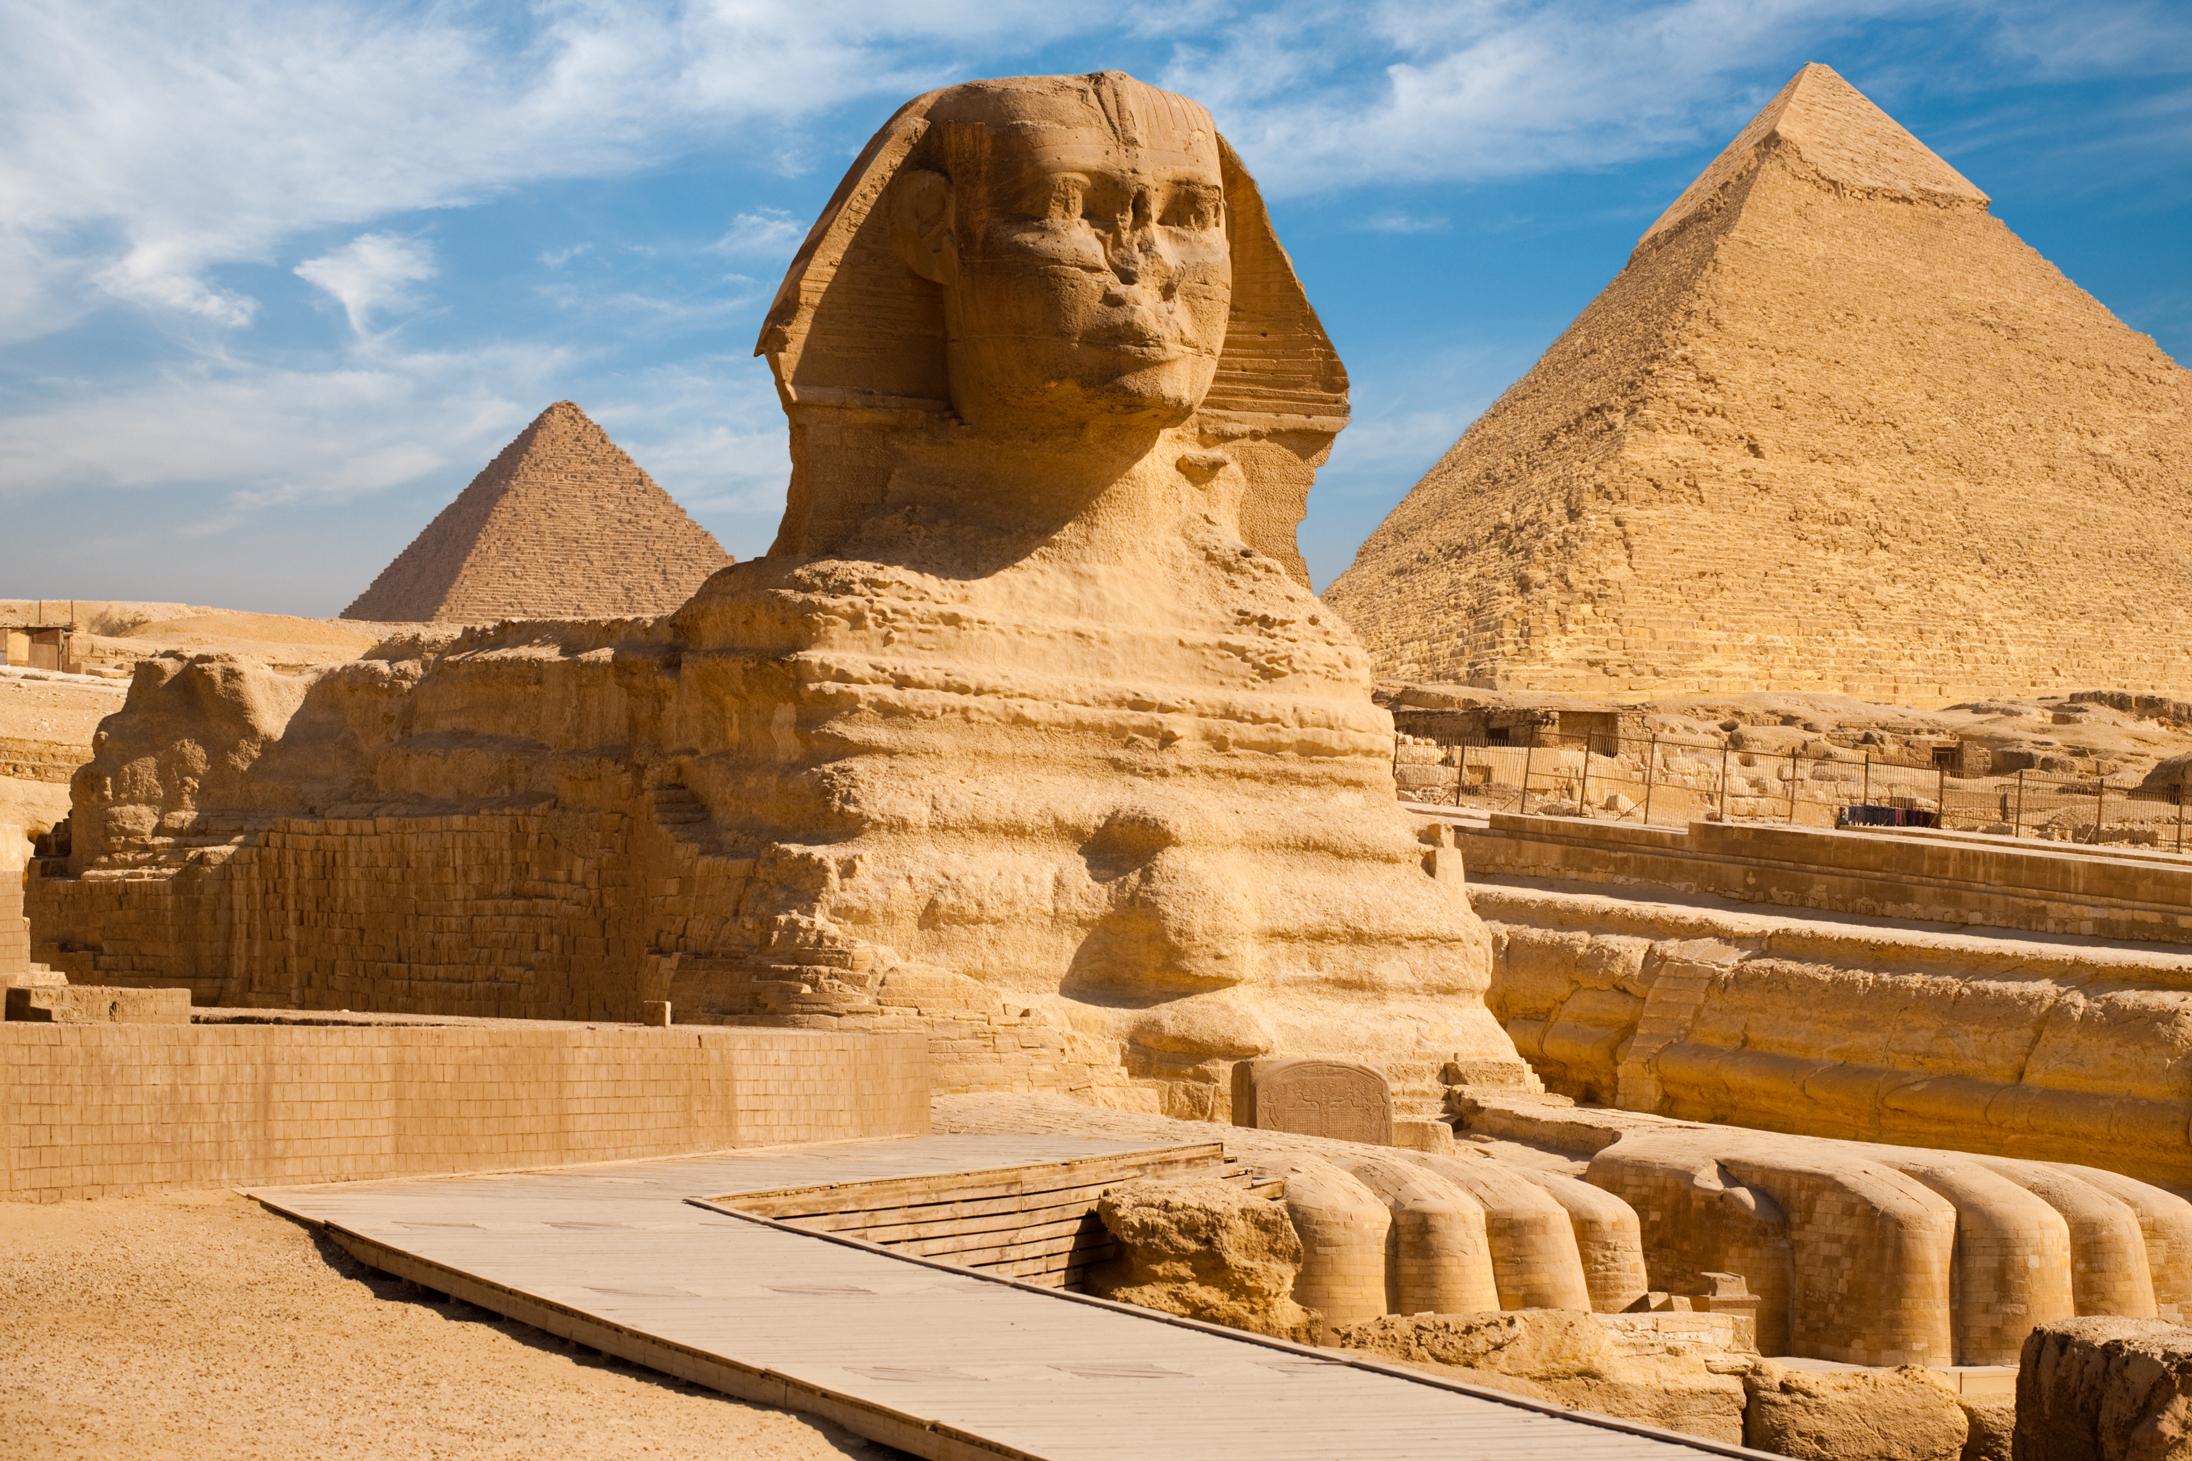 egypt pyramids sphinx inside - photo #16